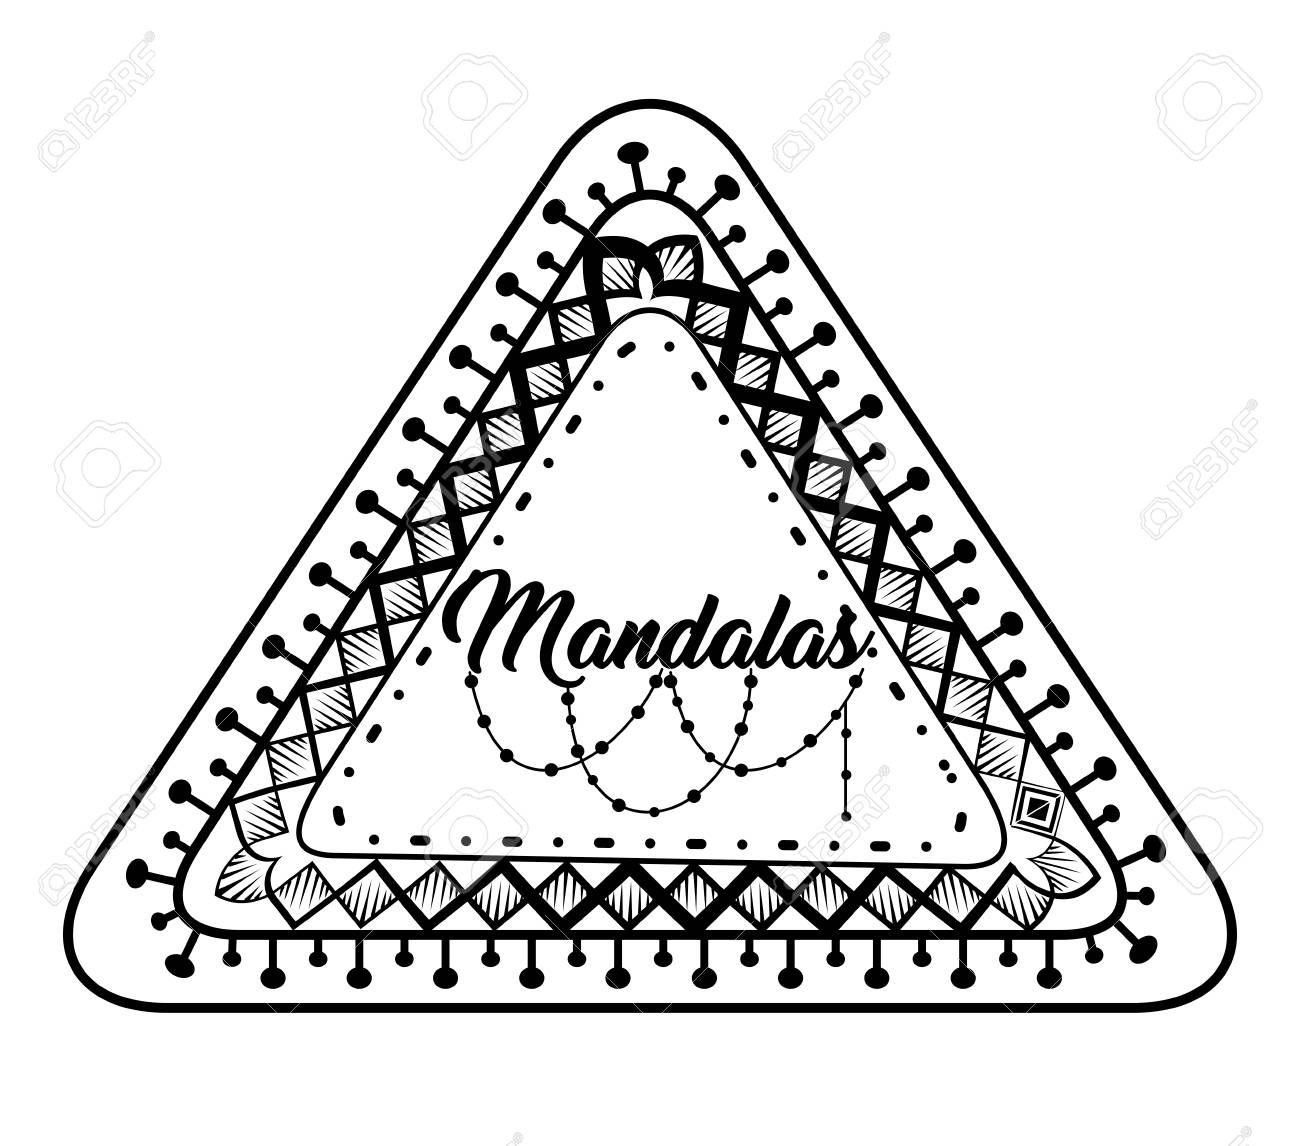 Mandala monochrome decoration icon vector illustration